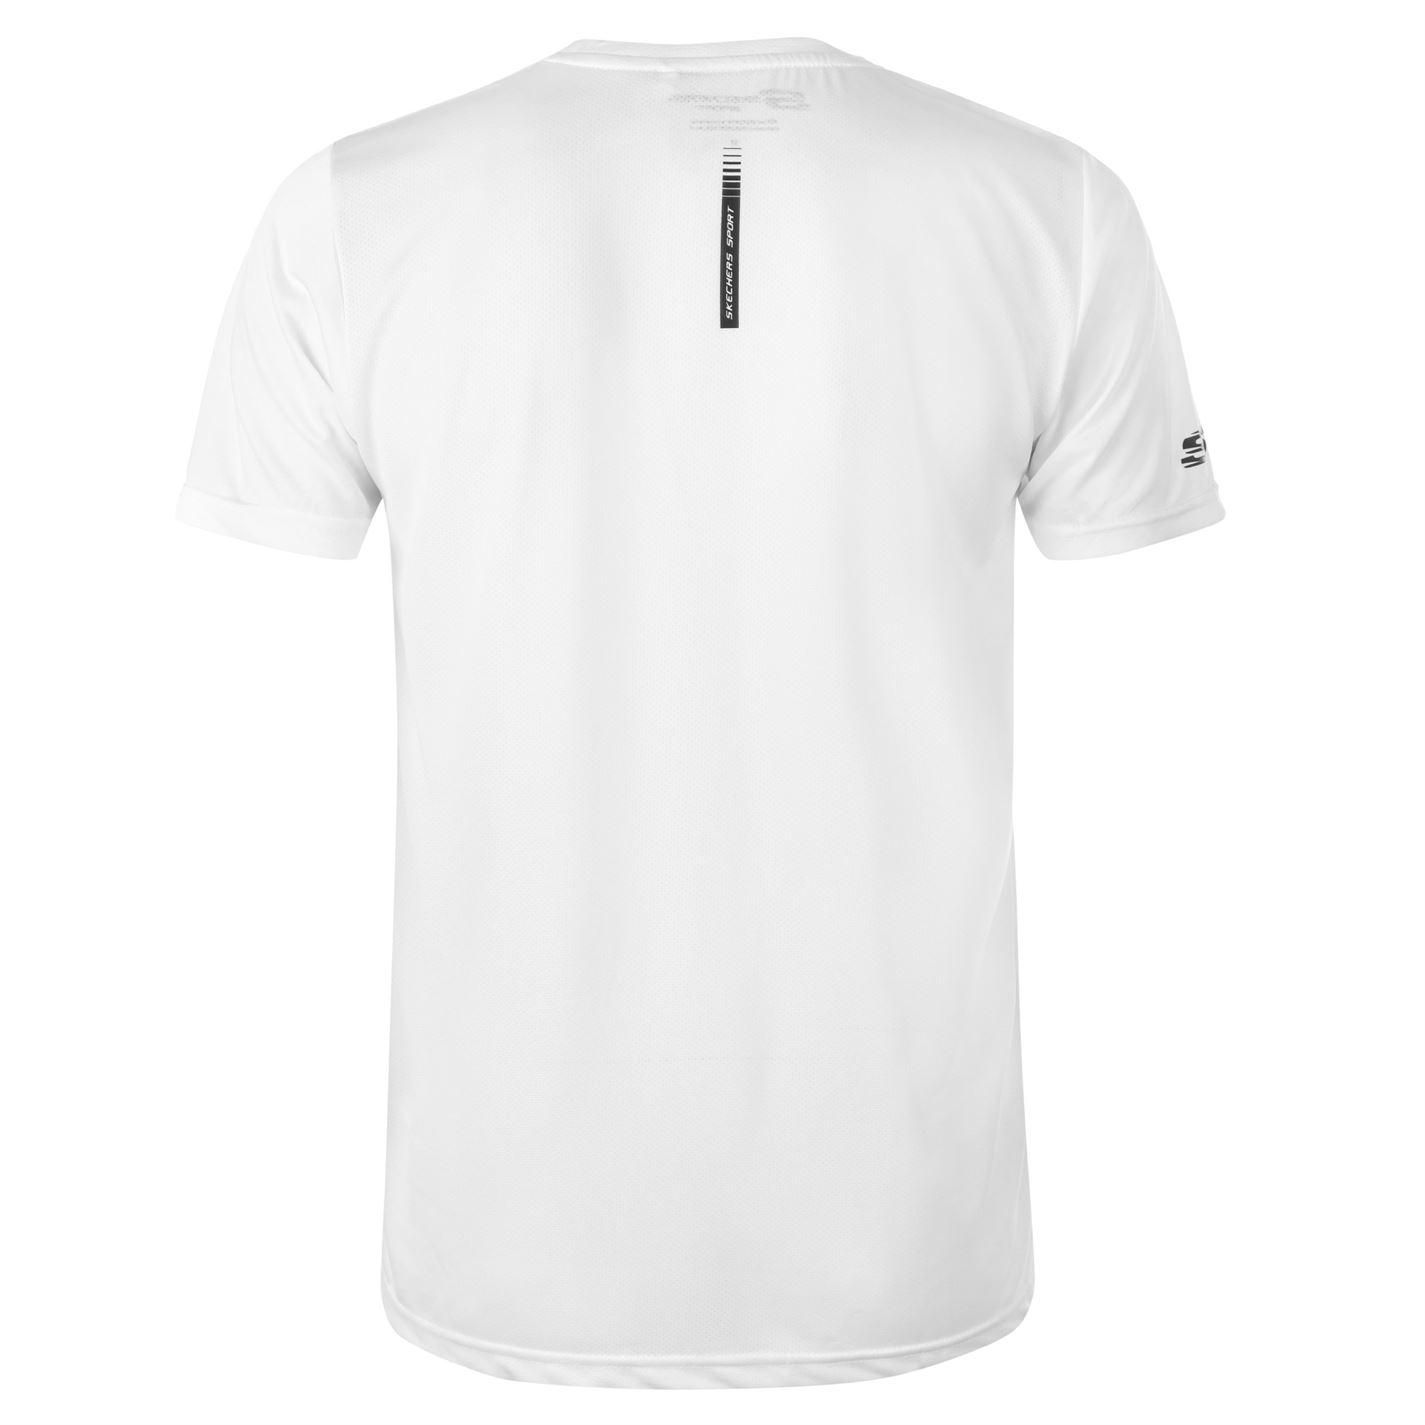 Skechers-Mens-Rendimiento-Grafico-camiseta-Manga-Corta-Camiseta-Top-Cuello-Redondo miniatura 6